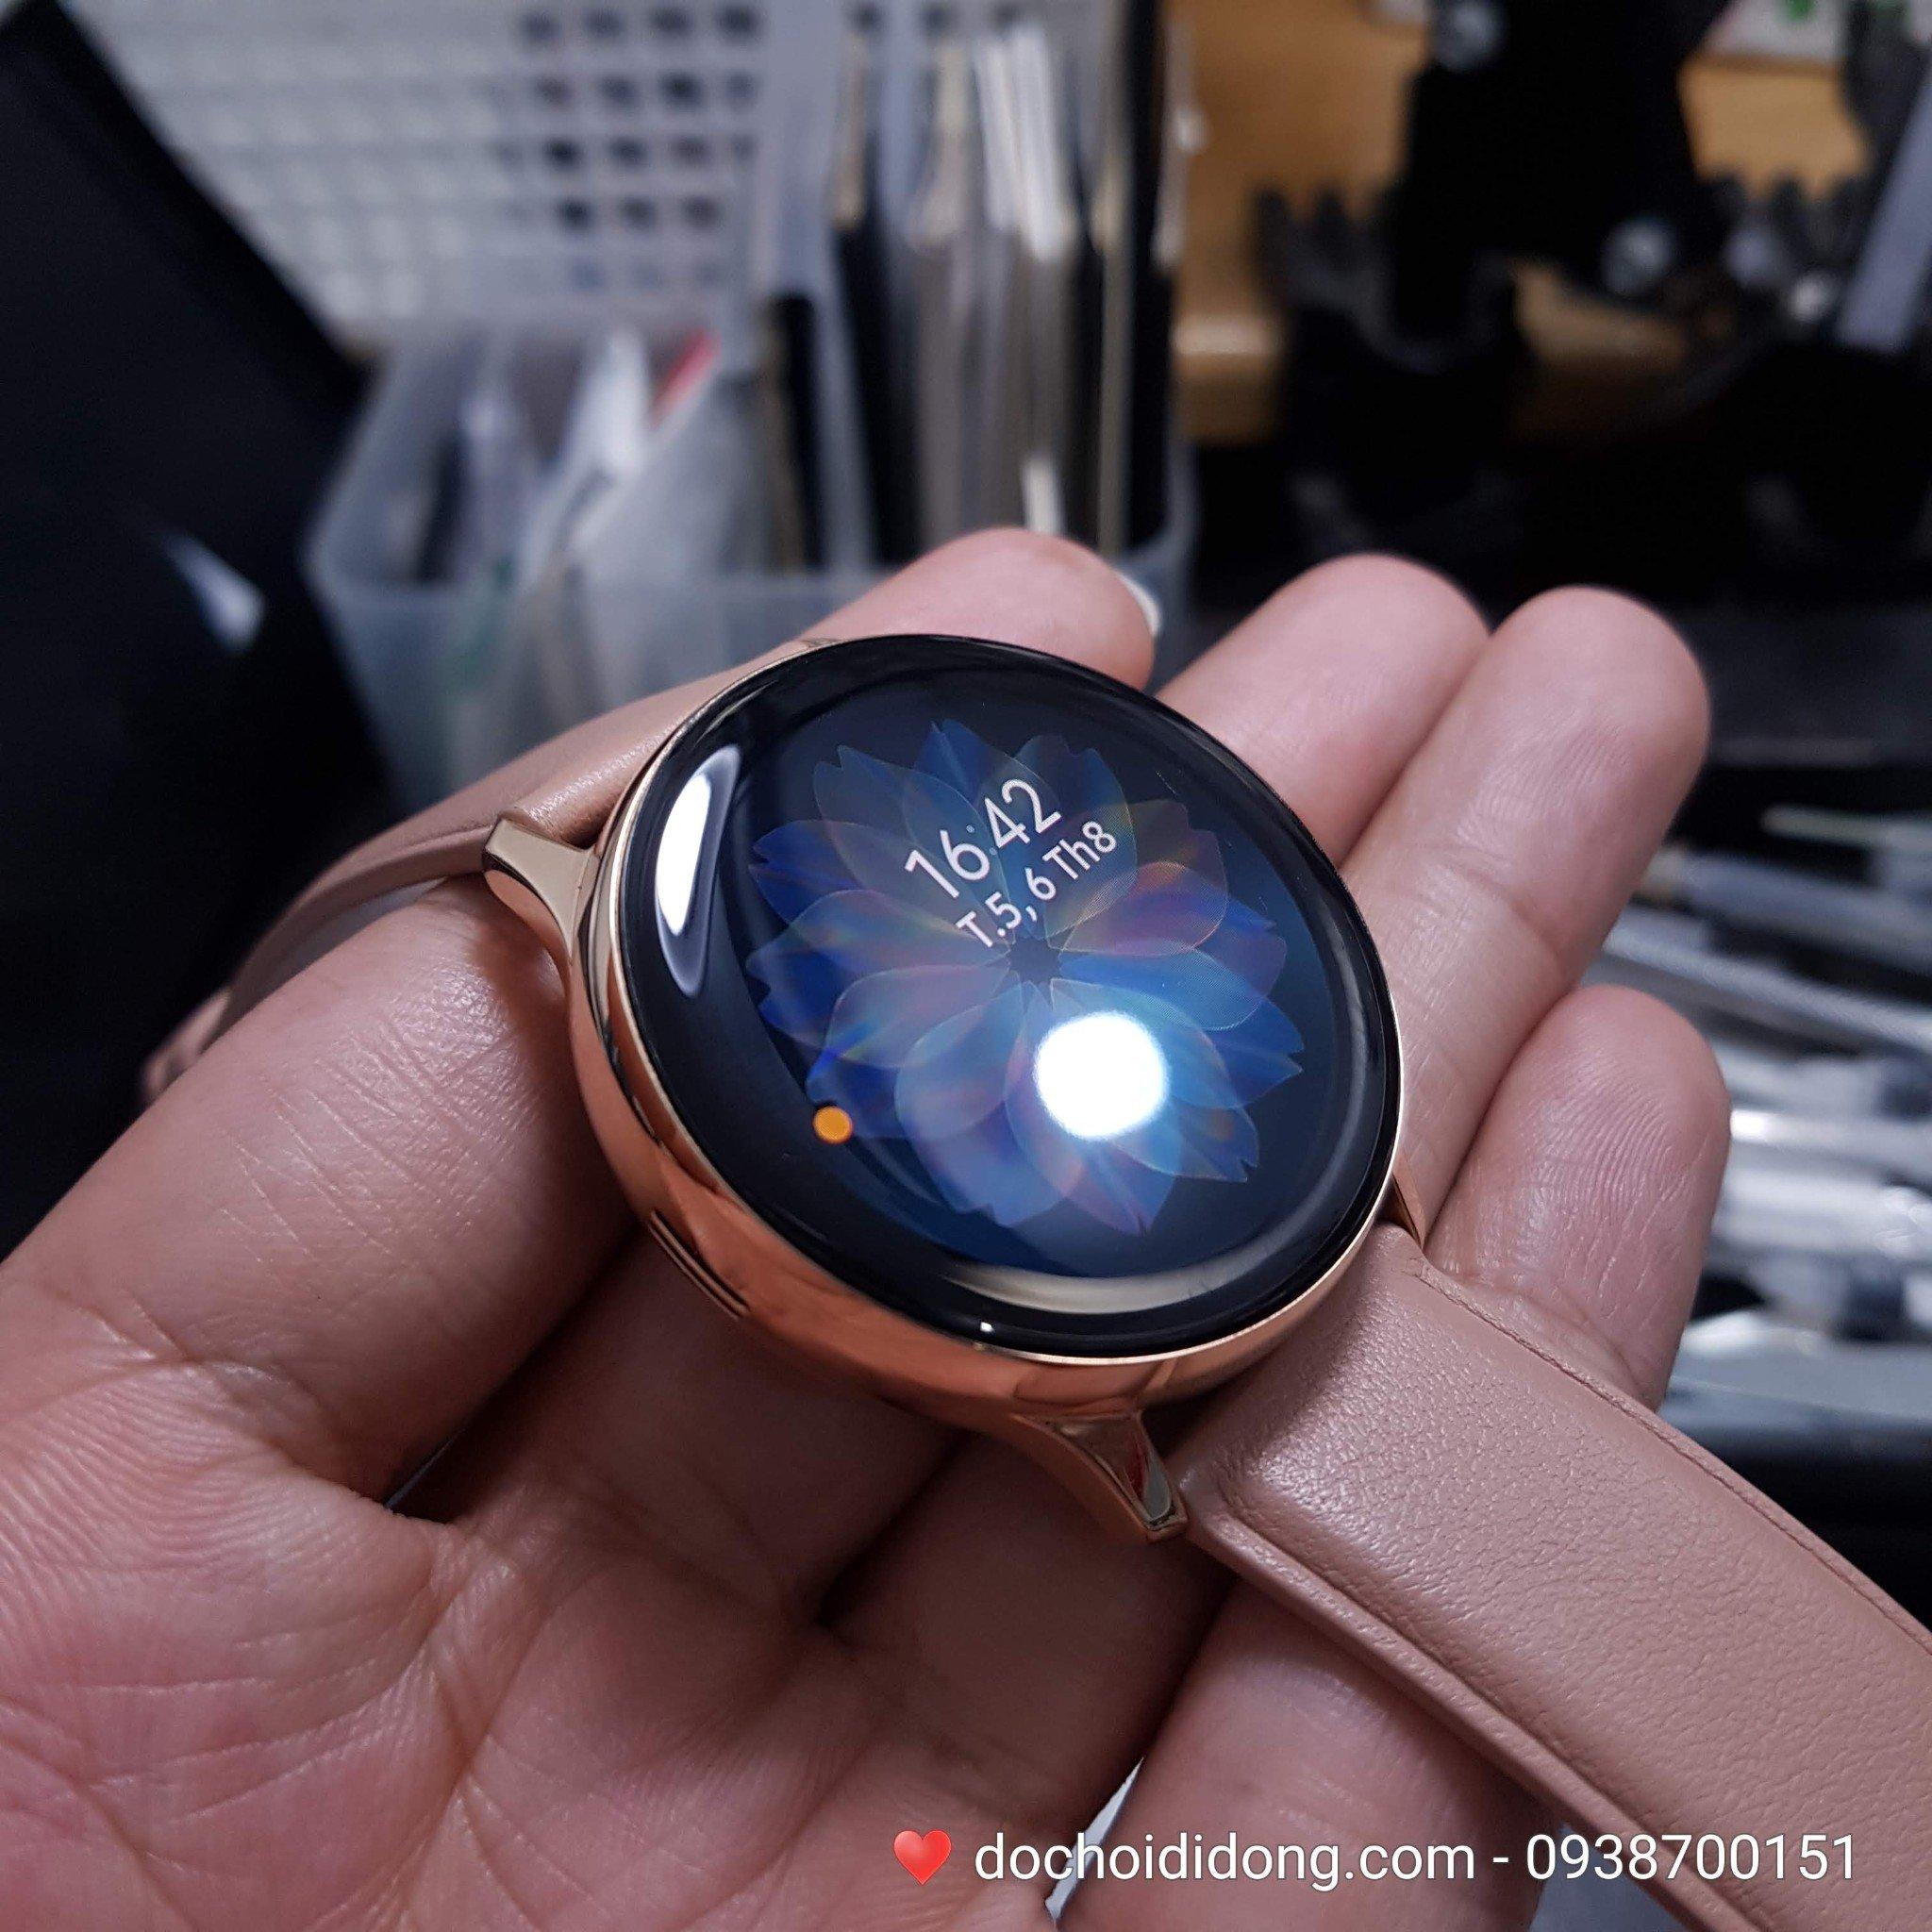 mieng-dan-ppf-rock-samsung-galaxy-watch-active-40-40mm-trong-nham-doi-mau-cao-cap